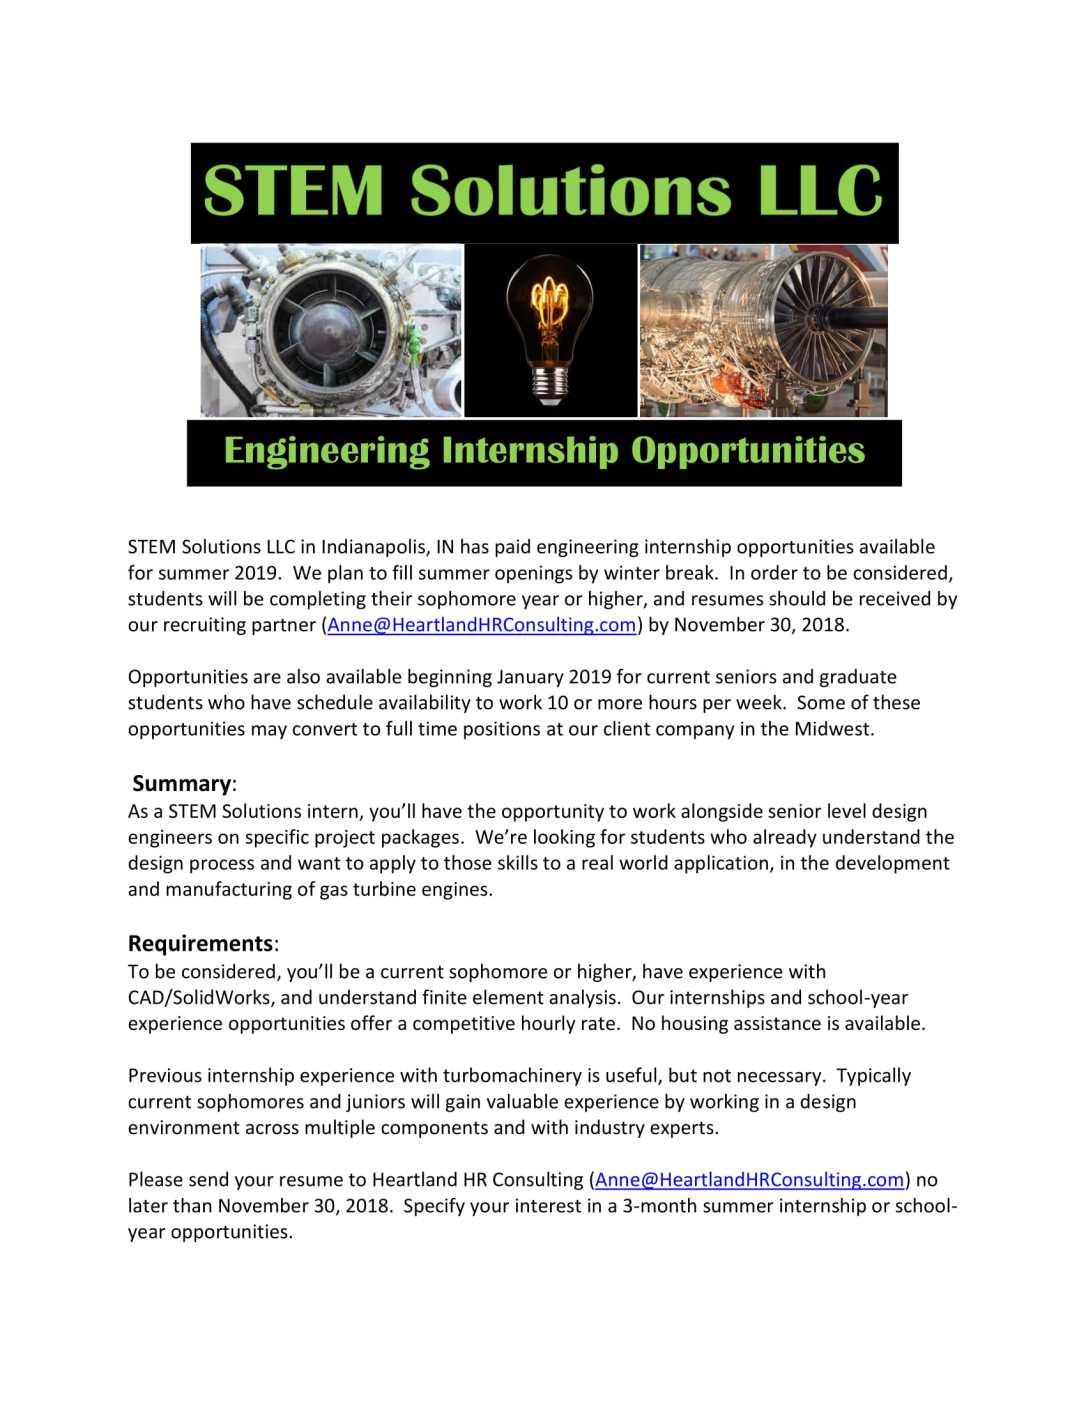 STEM Solutions intern flyer-1